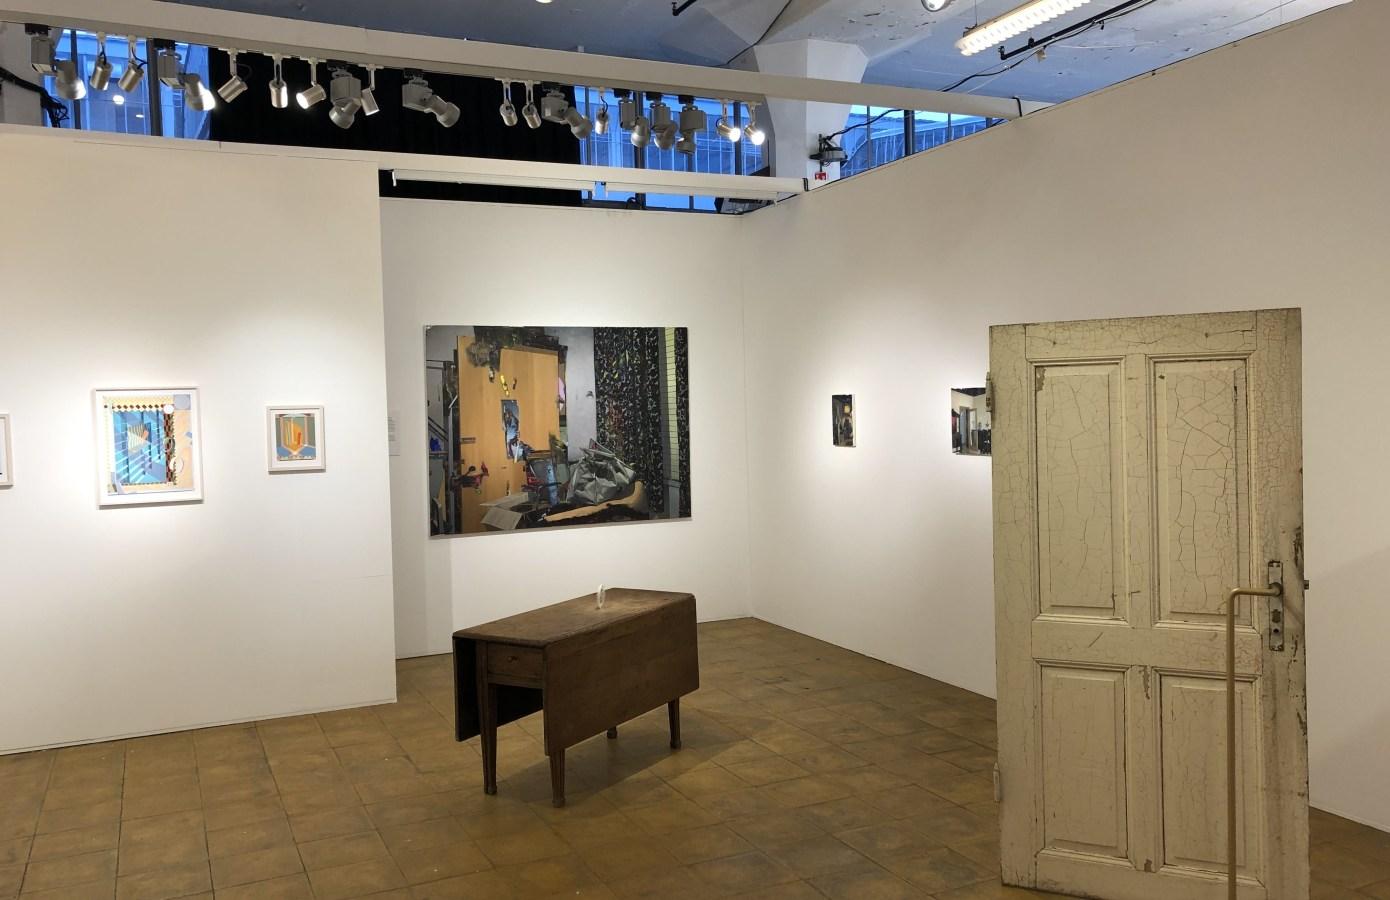 Art Rotterdam 2019, Robert Bartra, Carlos Sagrera, Matthias Schaareman,